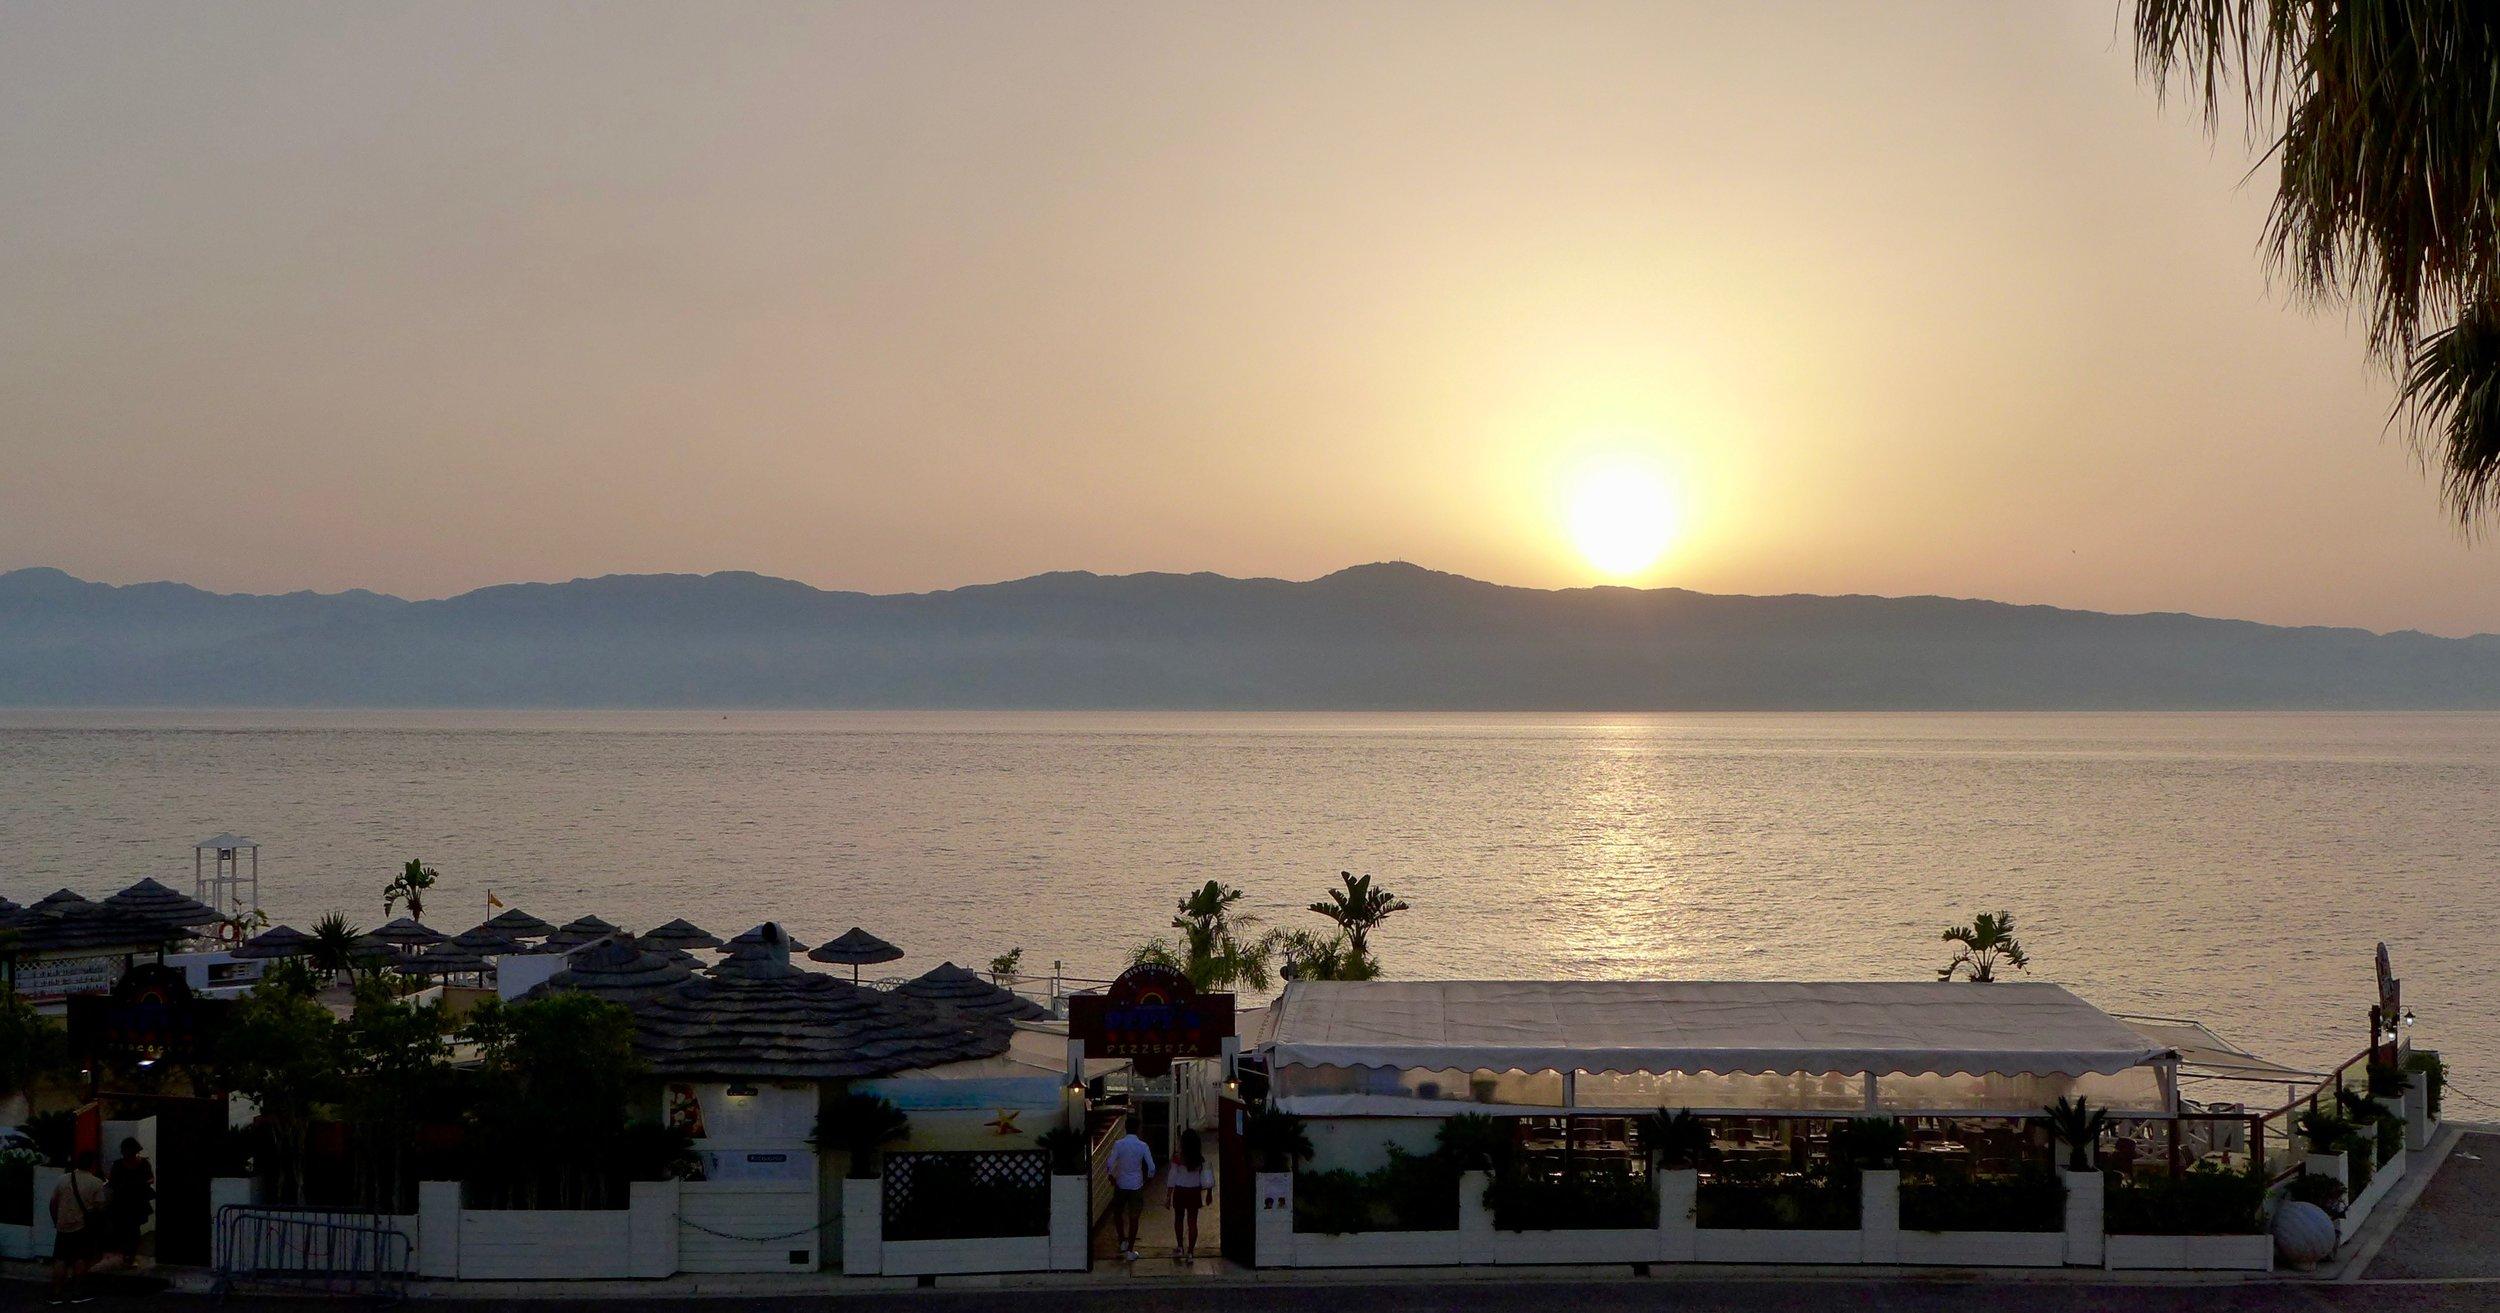 pepys-beach-sunset.jpg